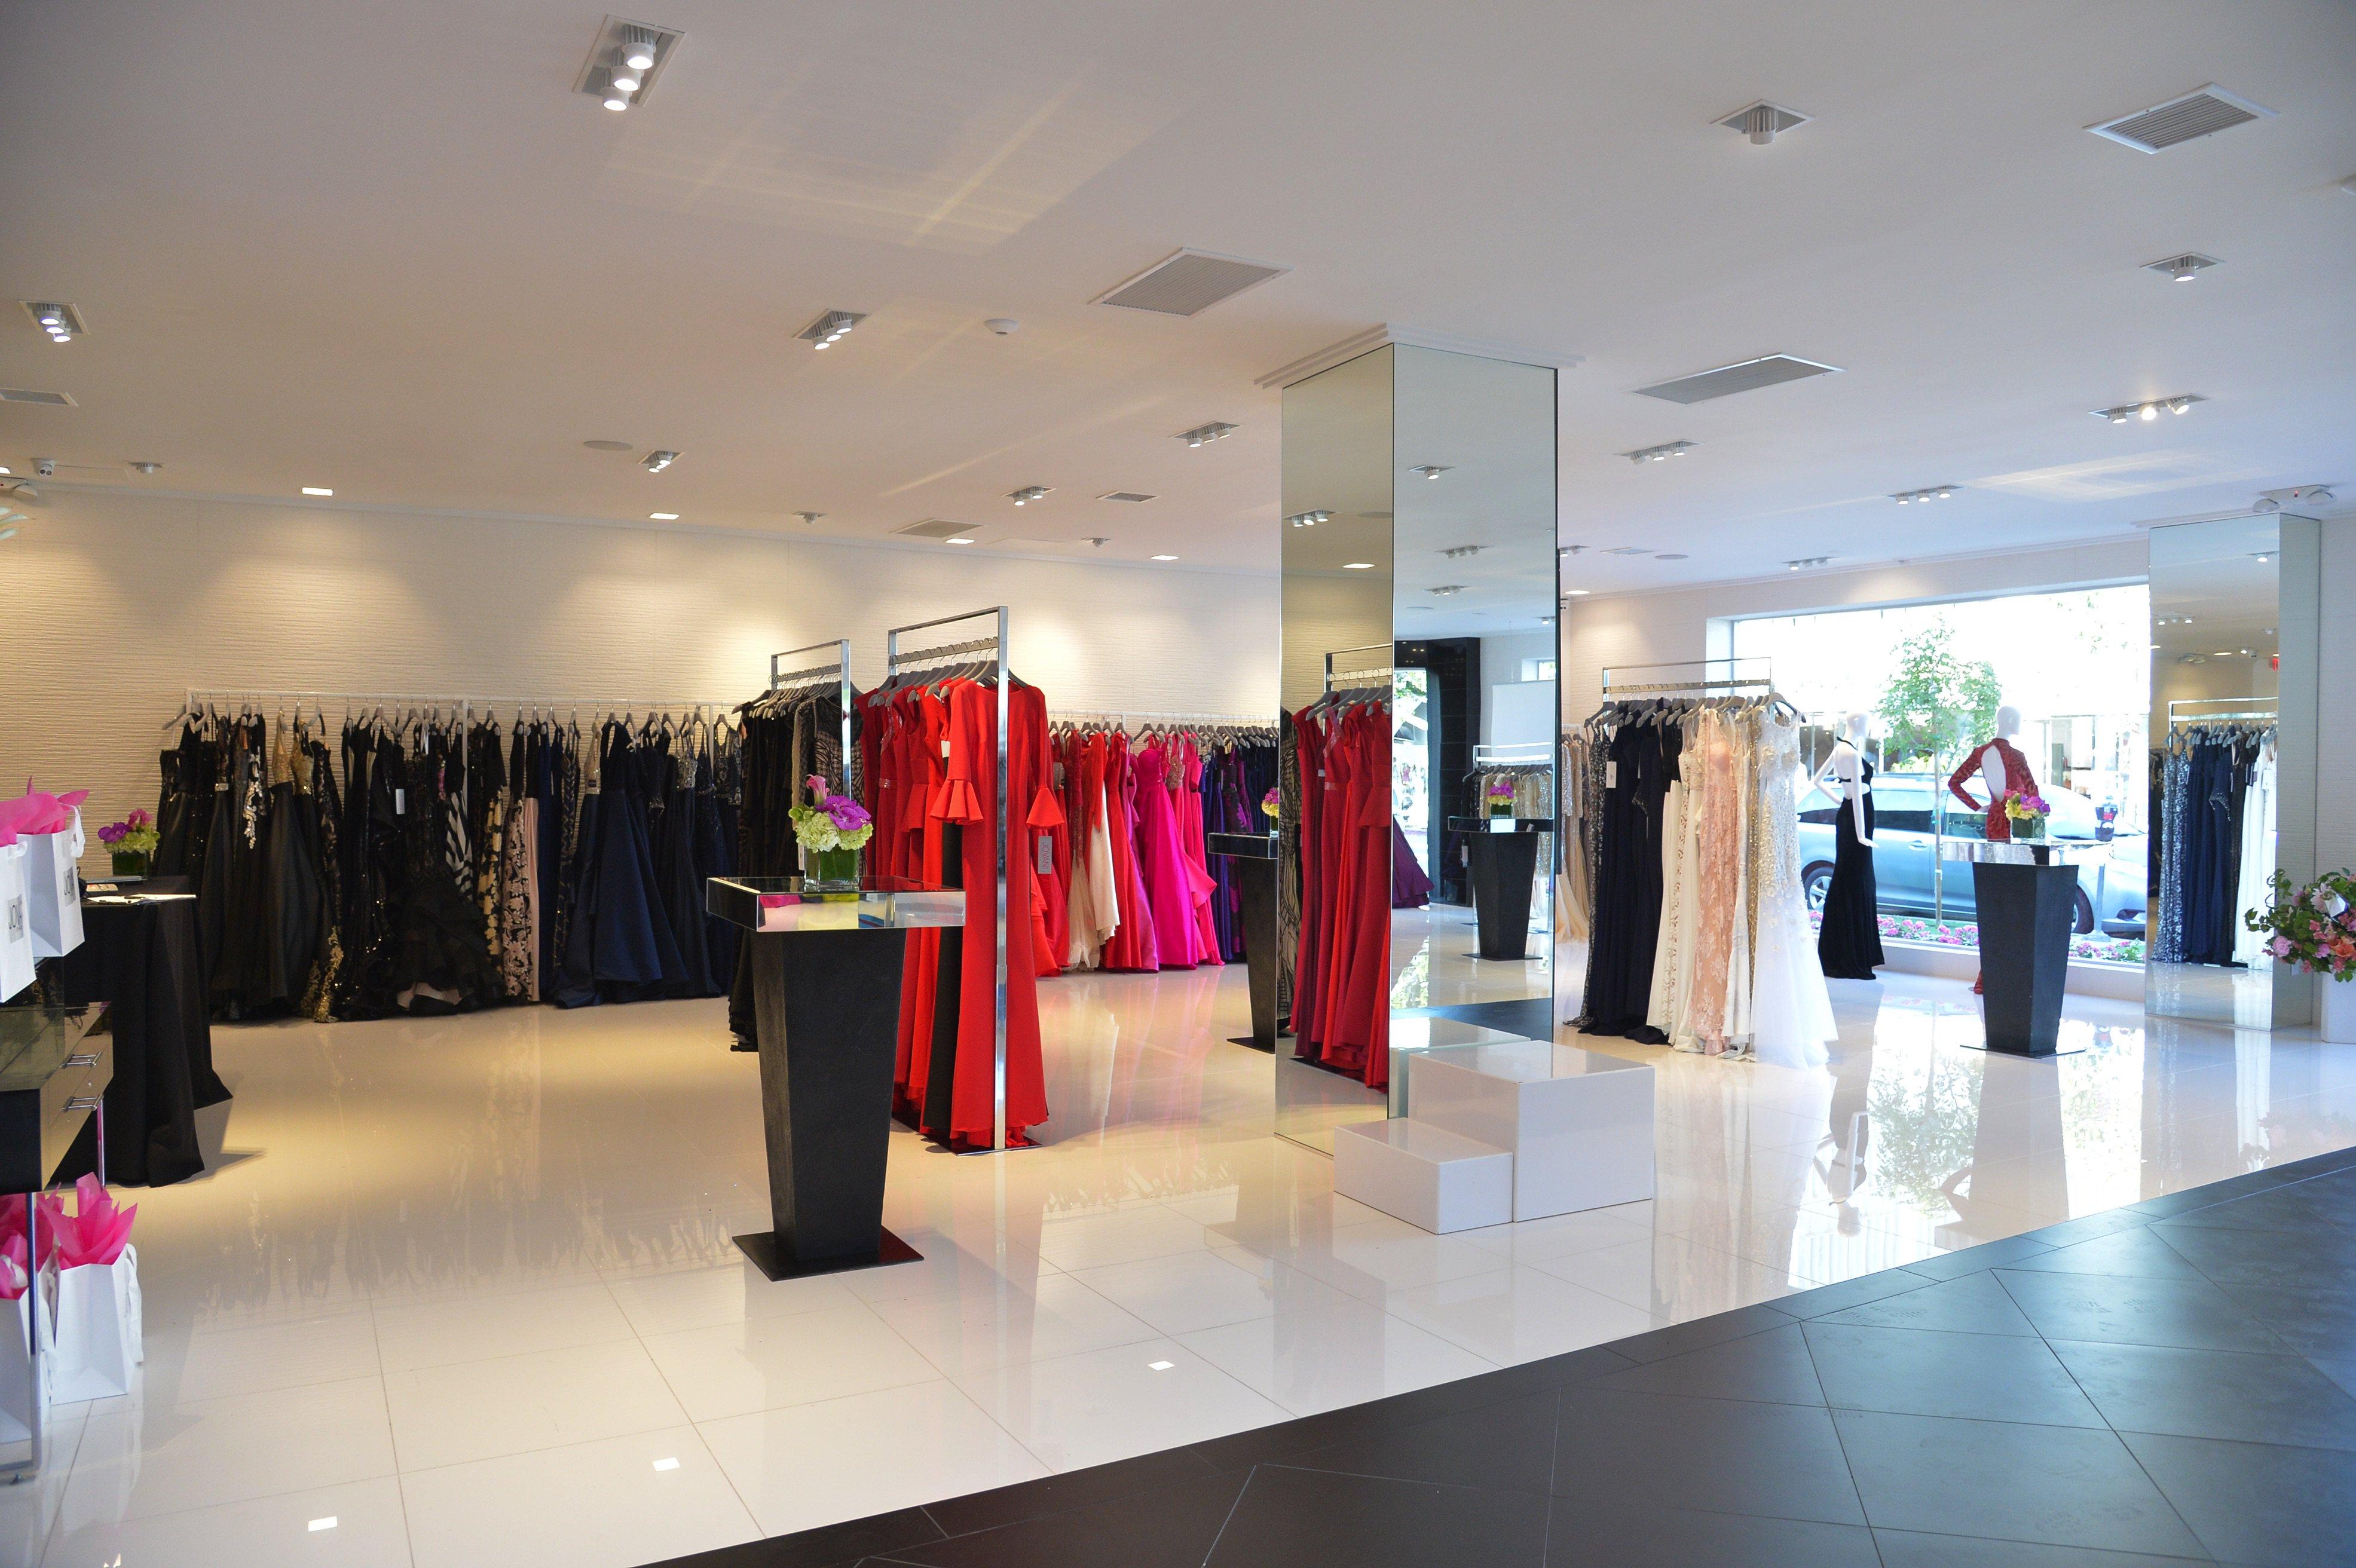 Prom Dresses Los Angeles California  Top Prom Dresses Store